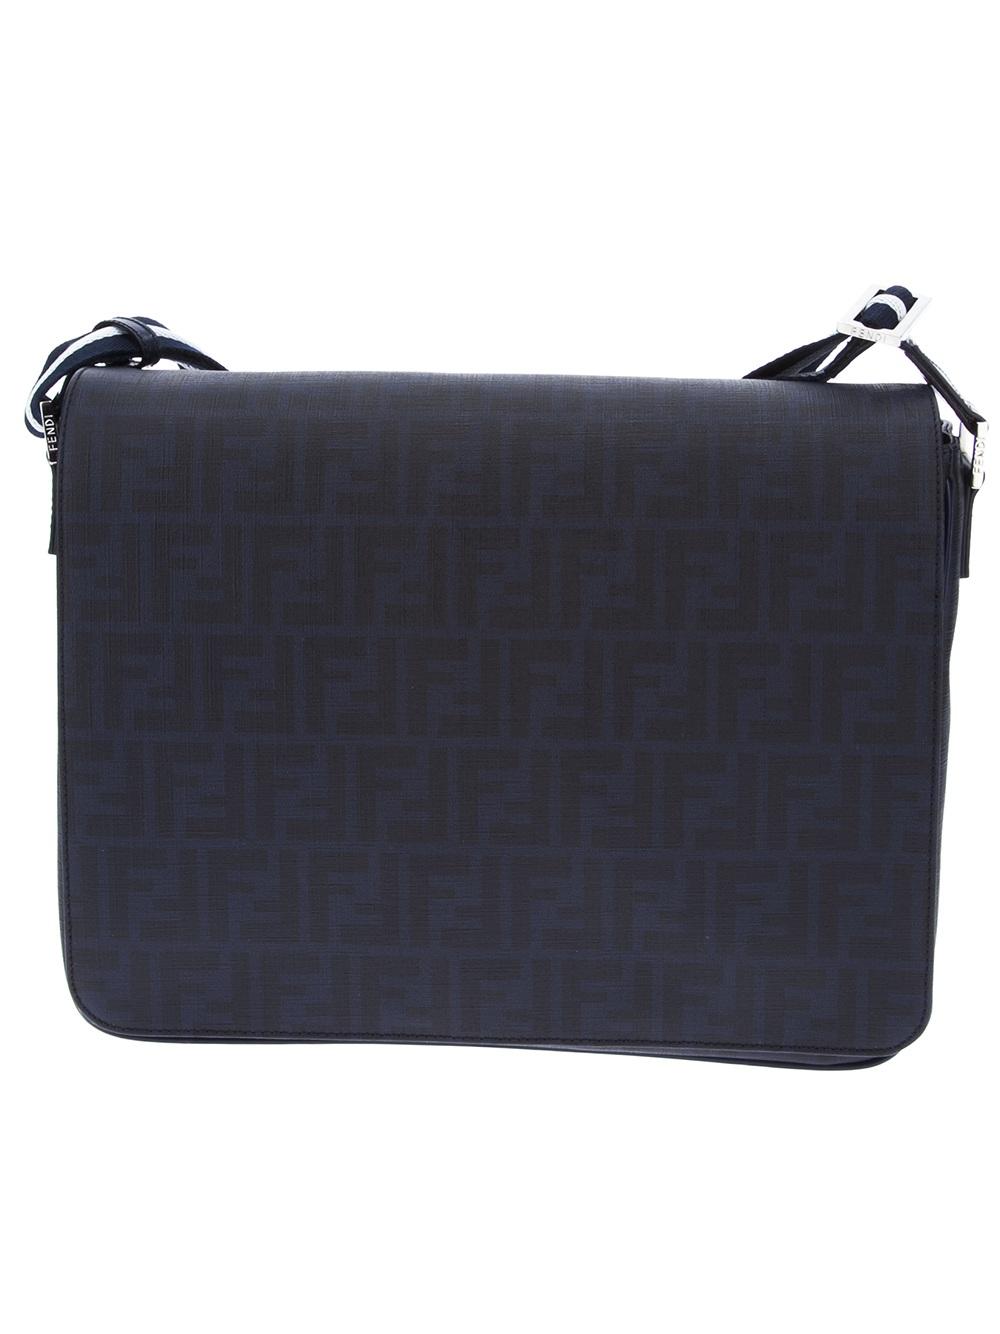 f7983c6ddf7 ... Black -  quality design 7674d d7ed0 Fendi Zucca Forever Messenger Bag  in Blue for Men - Lyst ...